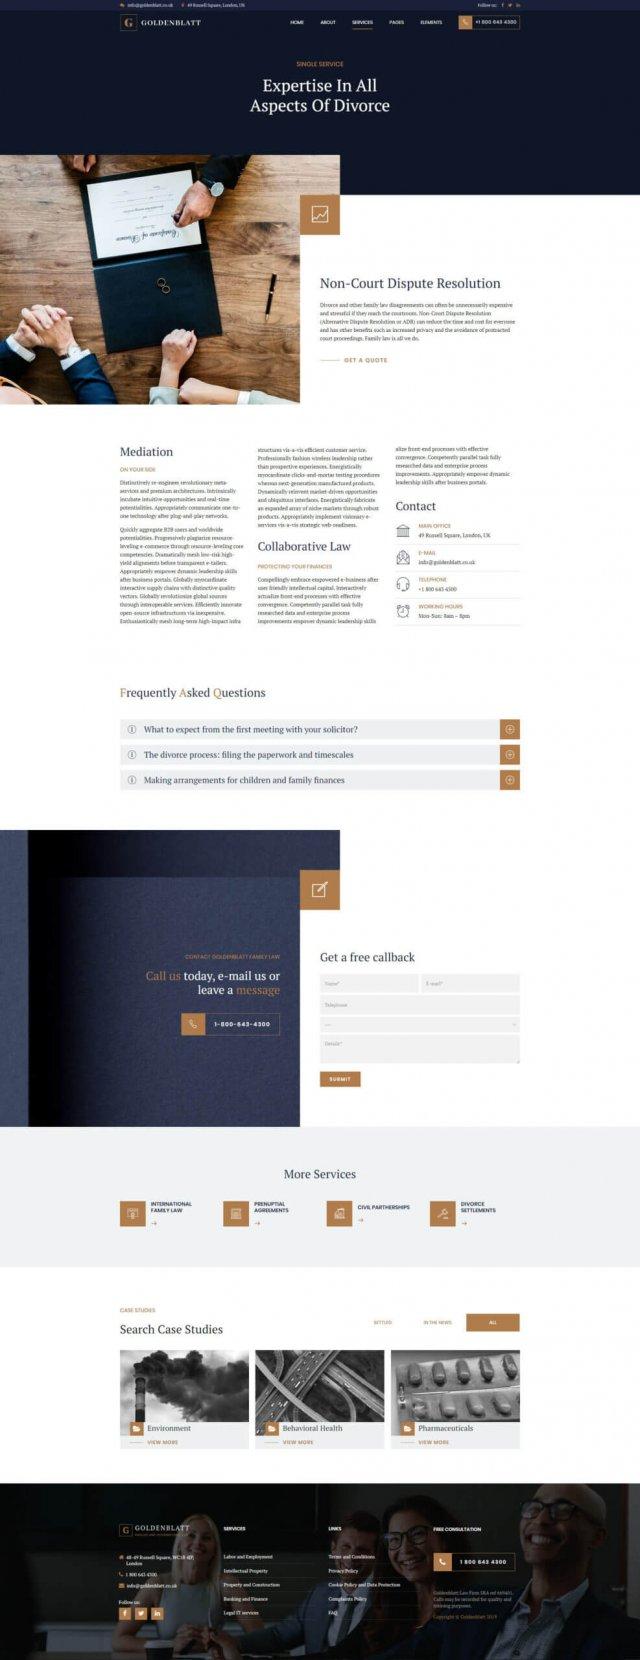 https://goldenblatt.bold-themes.com/wp-content/uploads/2019/12/Single-Service-scaled-640x1660.jpg